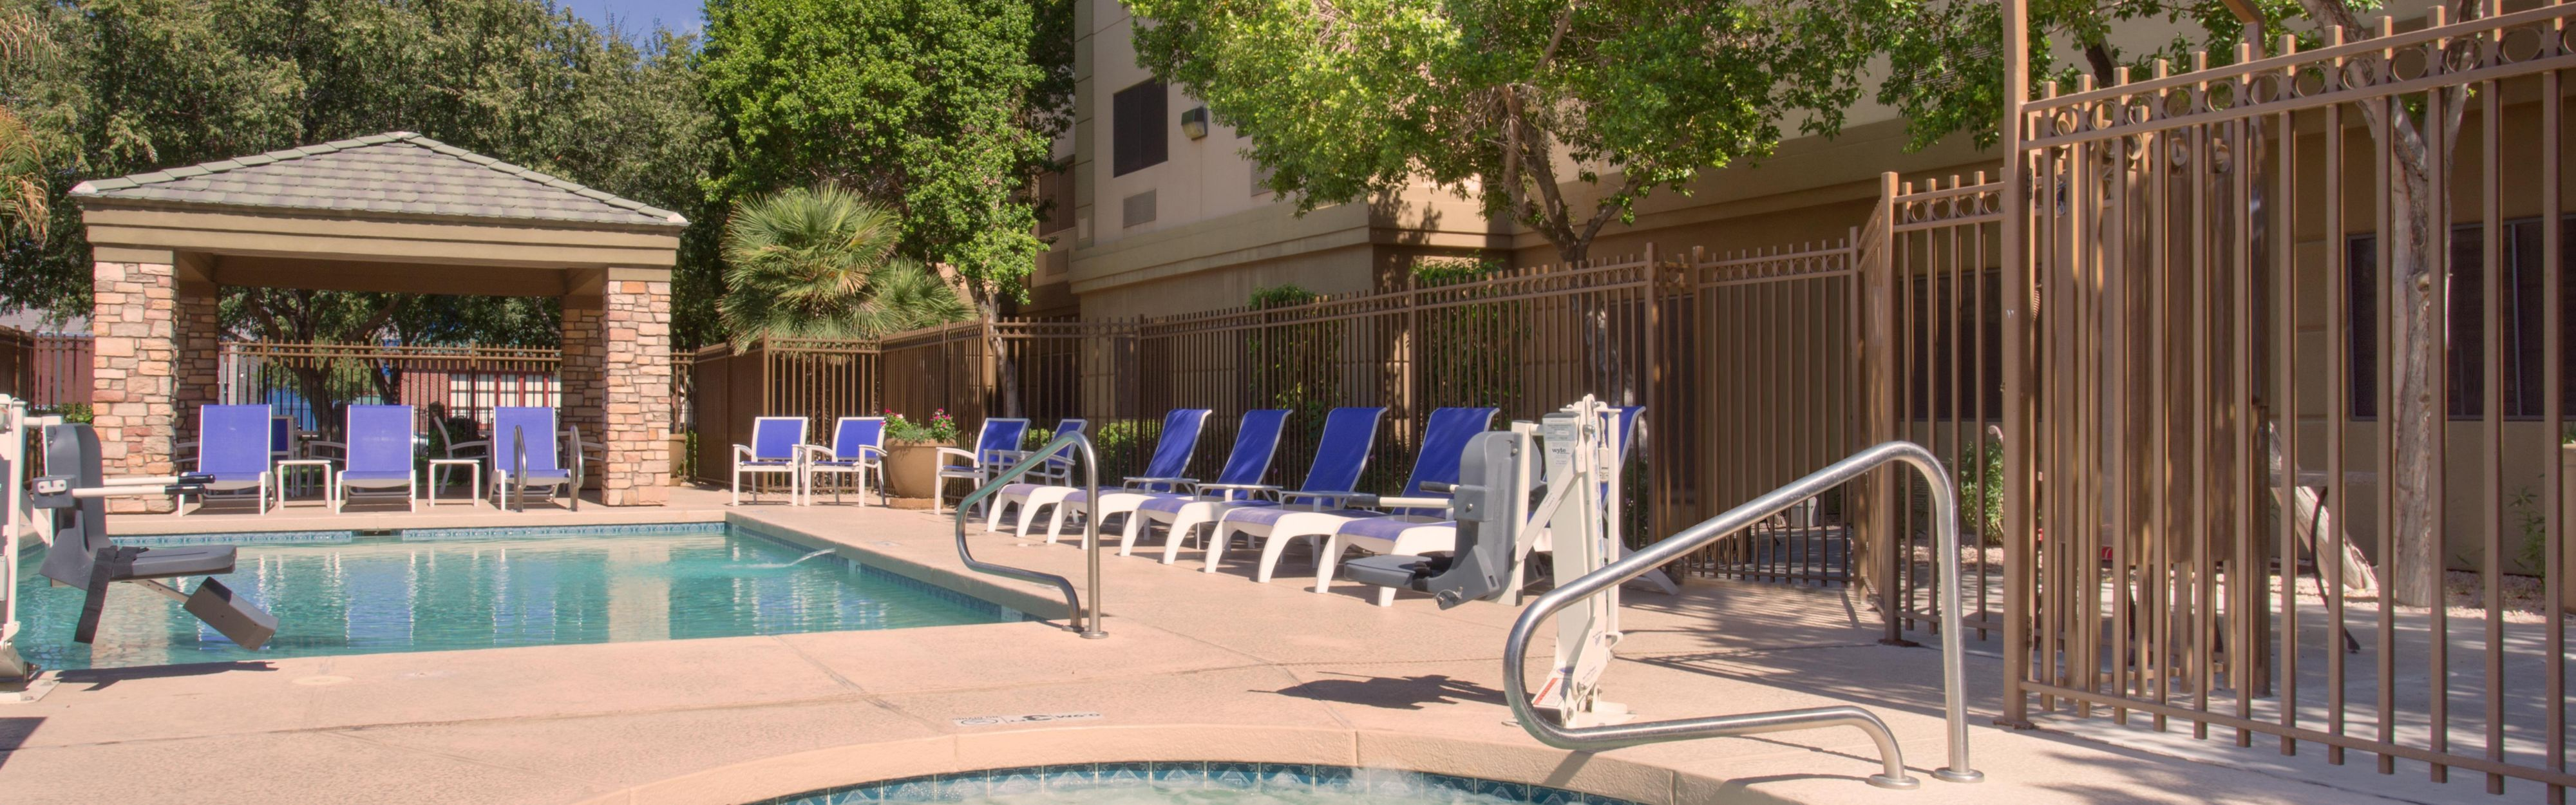 Holiday Inn Express & Suites Phoenix Downtown - Ballpark image 2